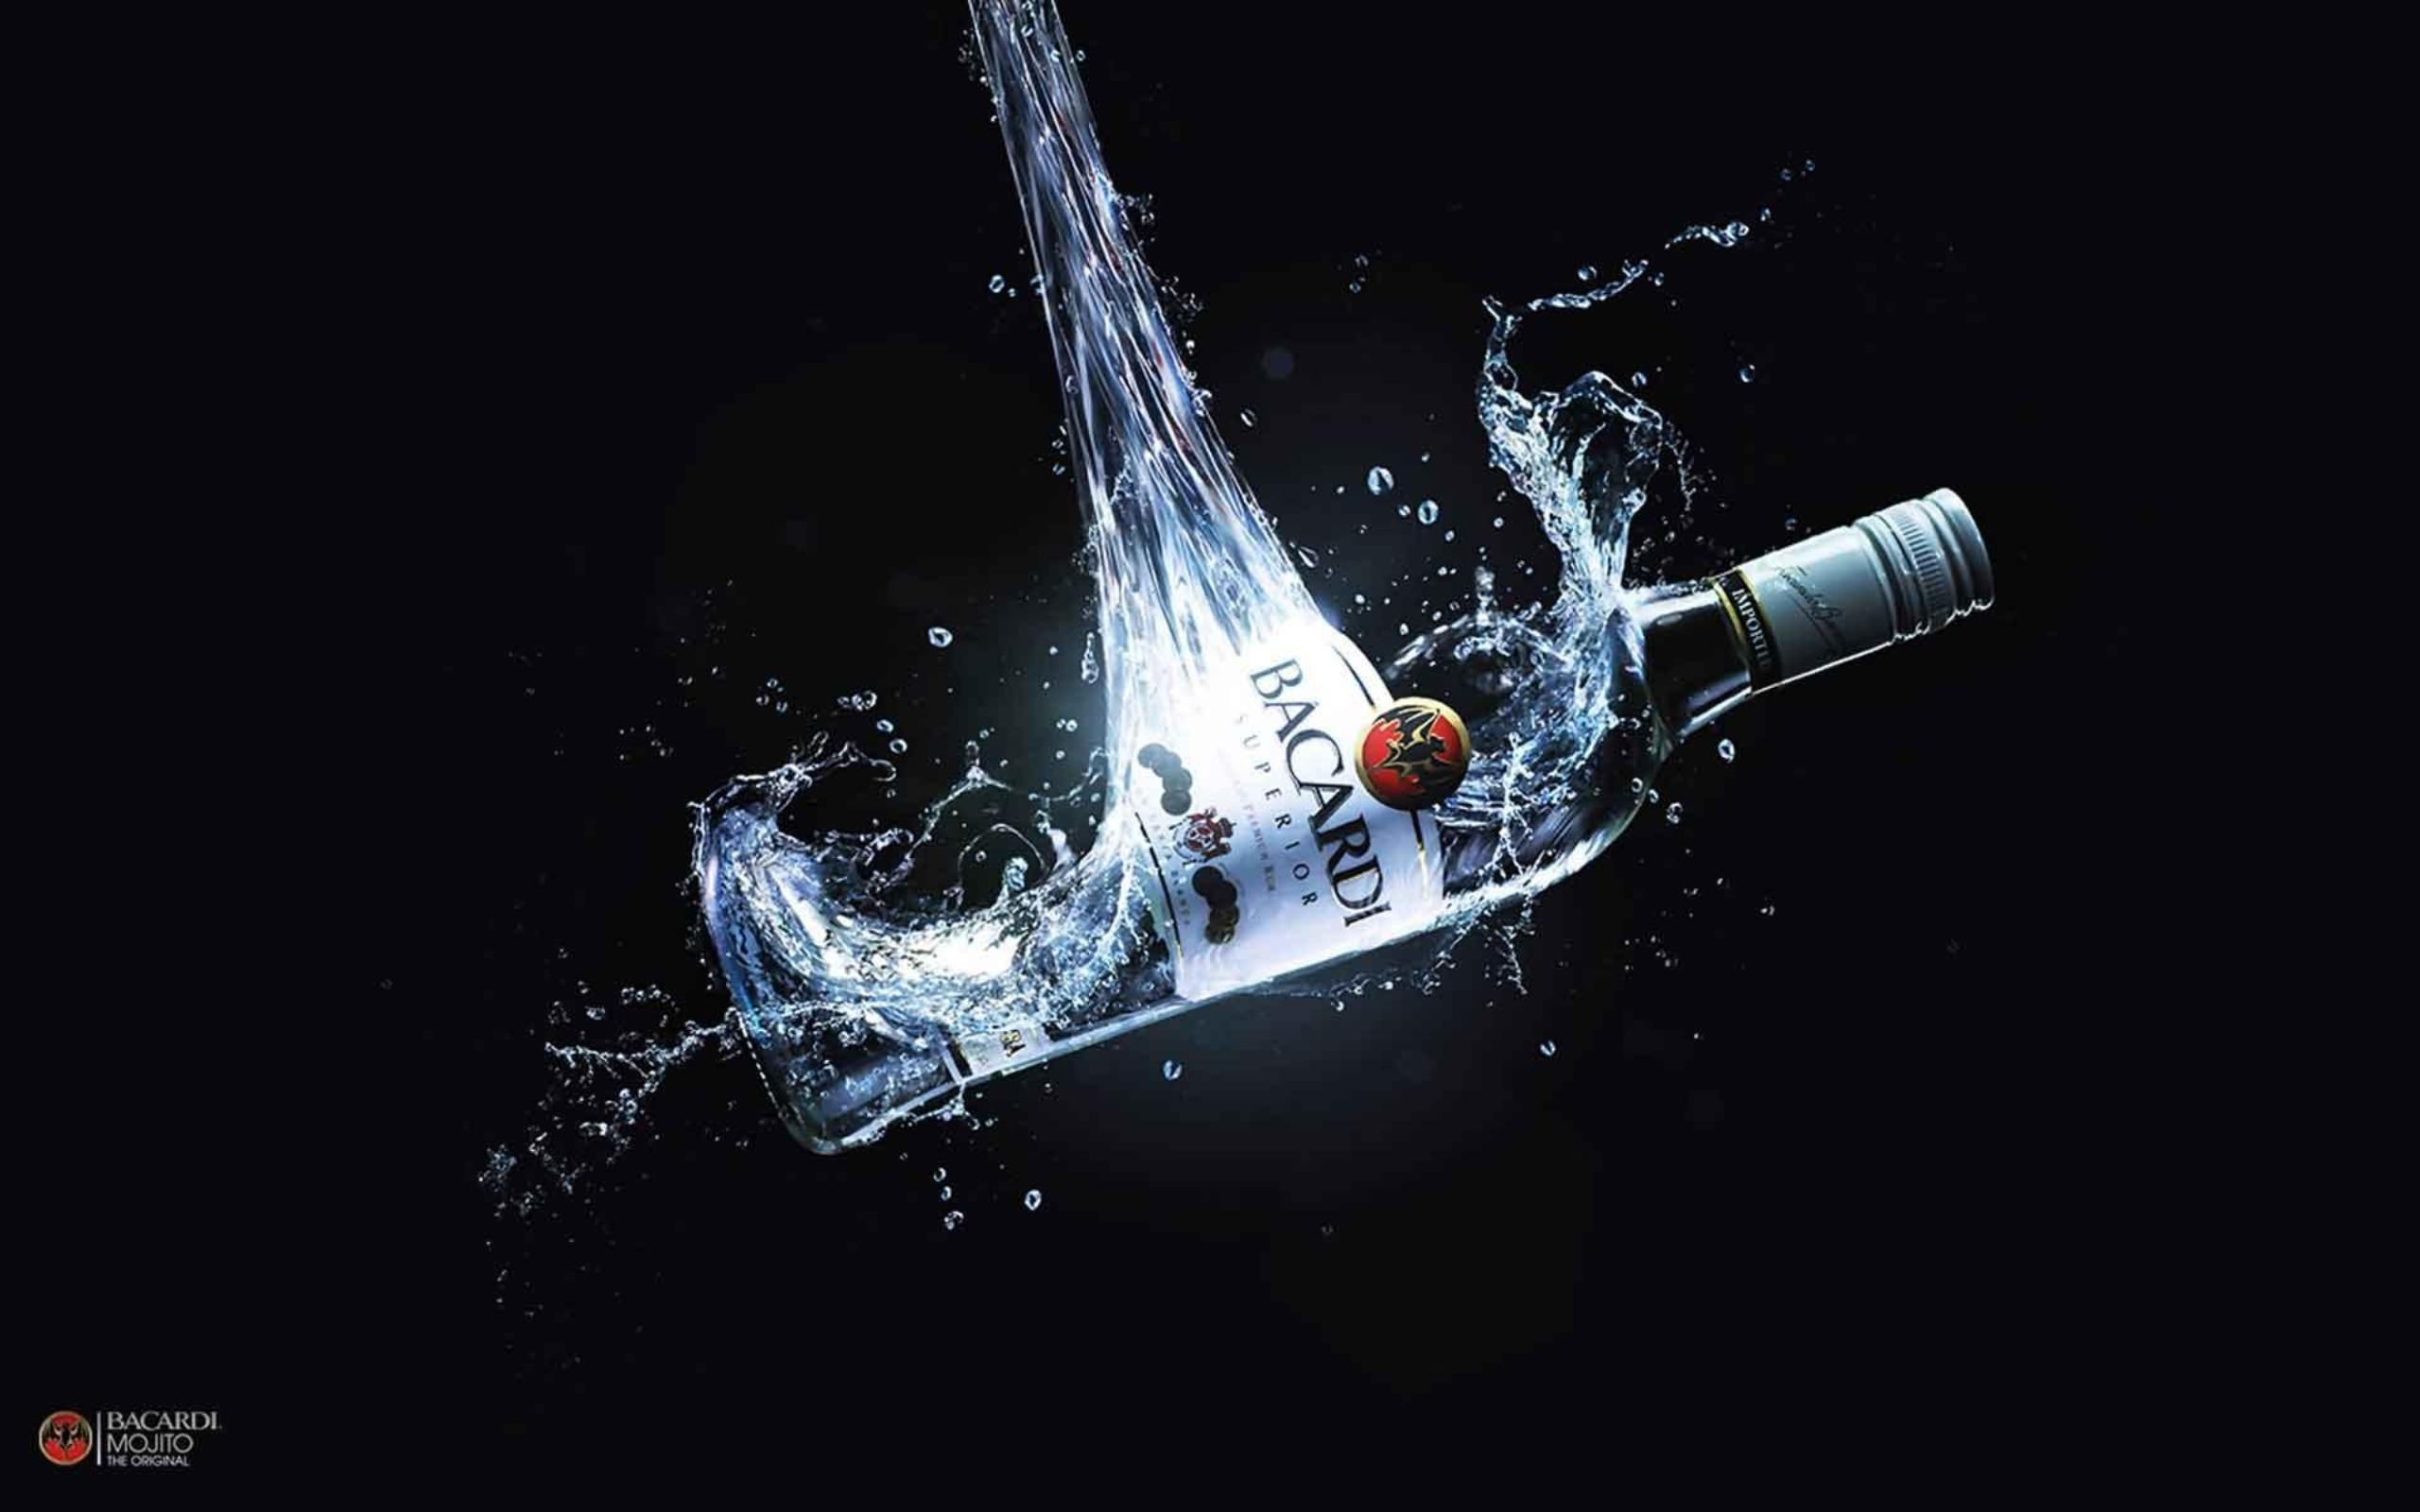 Water Bottles Liquid Bar Alcohol Advertisement Drinks